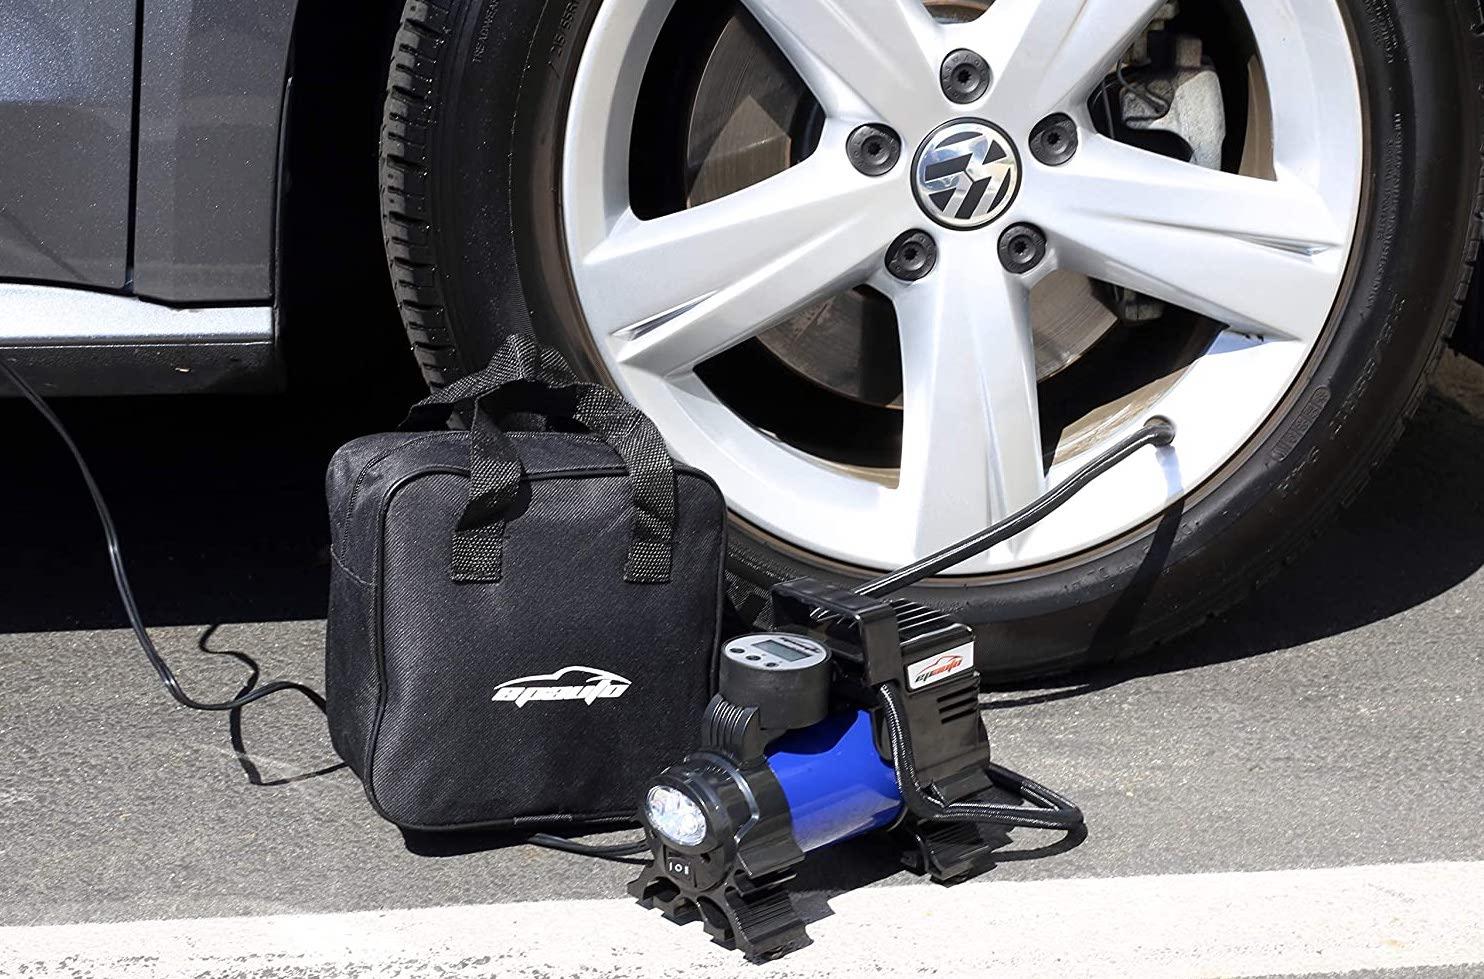 portable air compressor or digital tire inflator